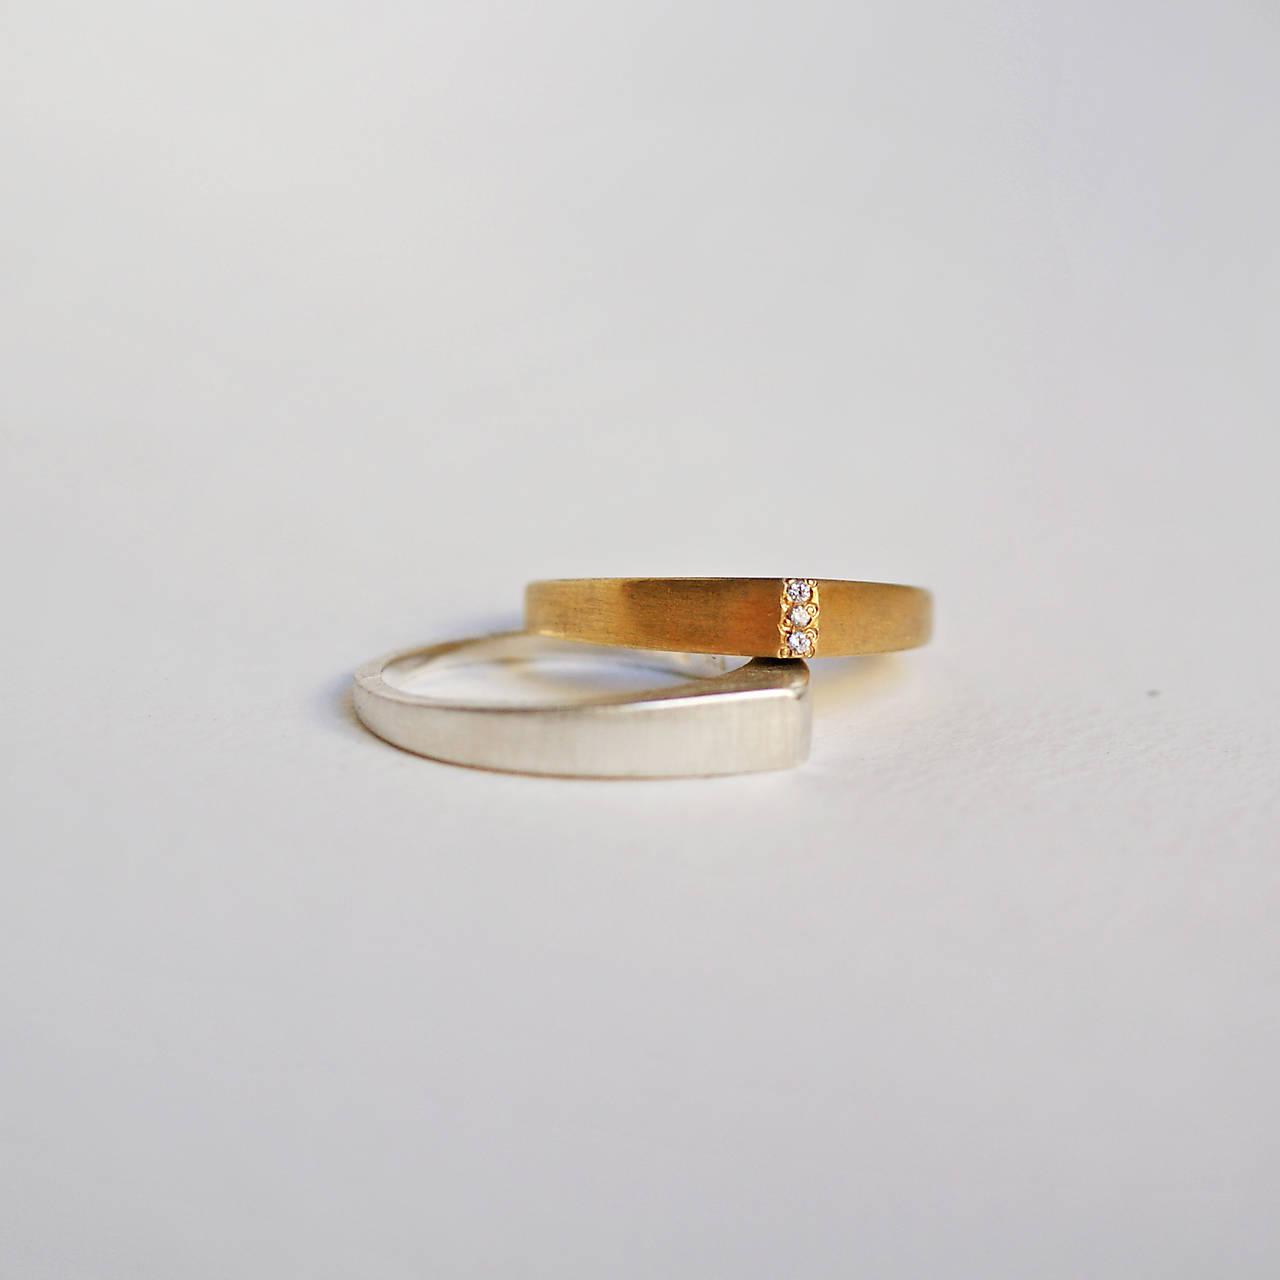 Originální stříbrný prsten Soren